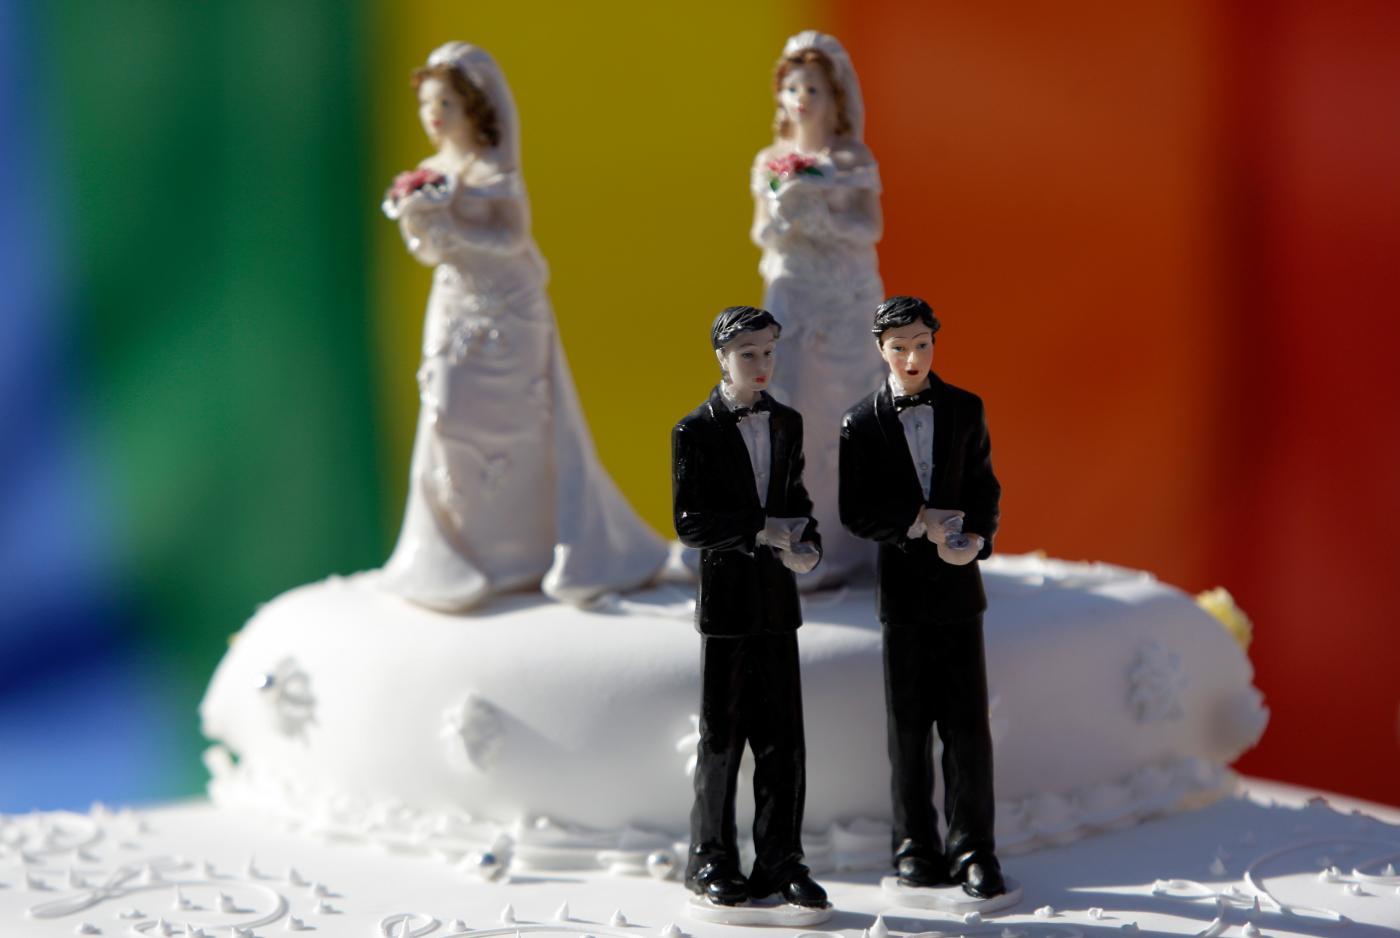 Gran Bretagna: celebrati i primi matrimoni gay